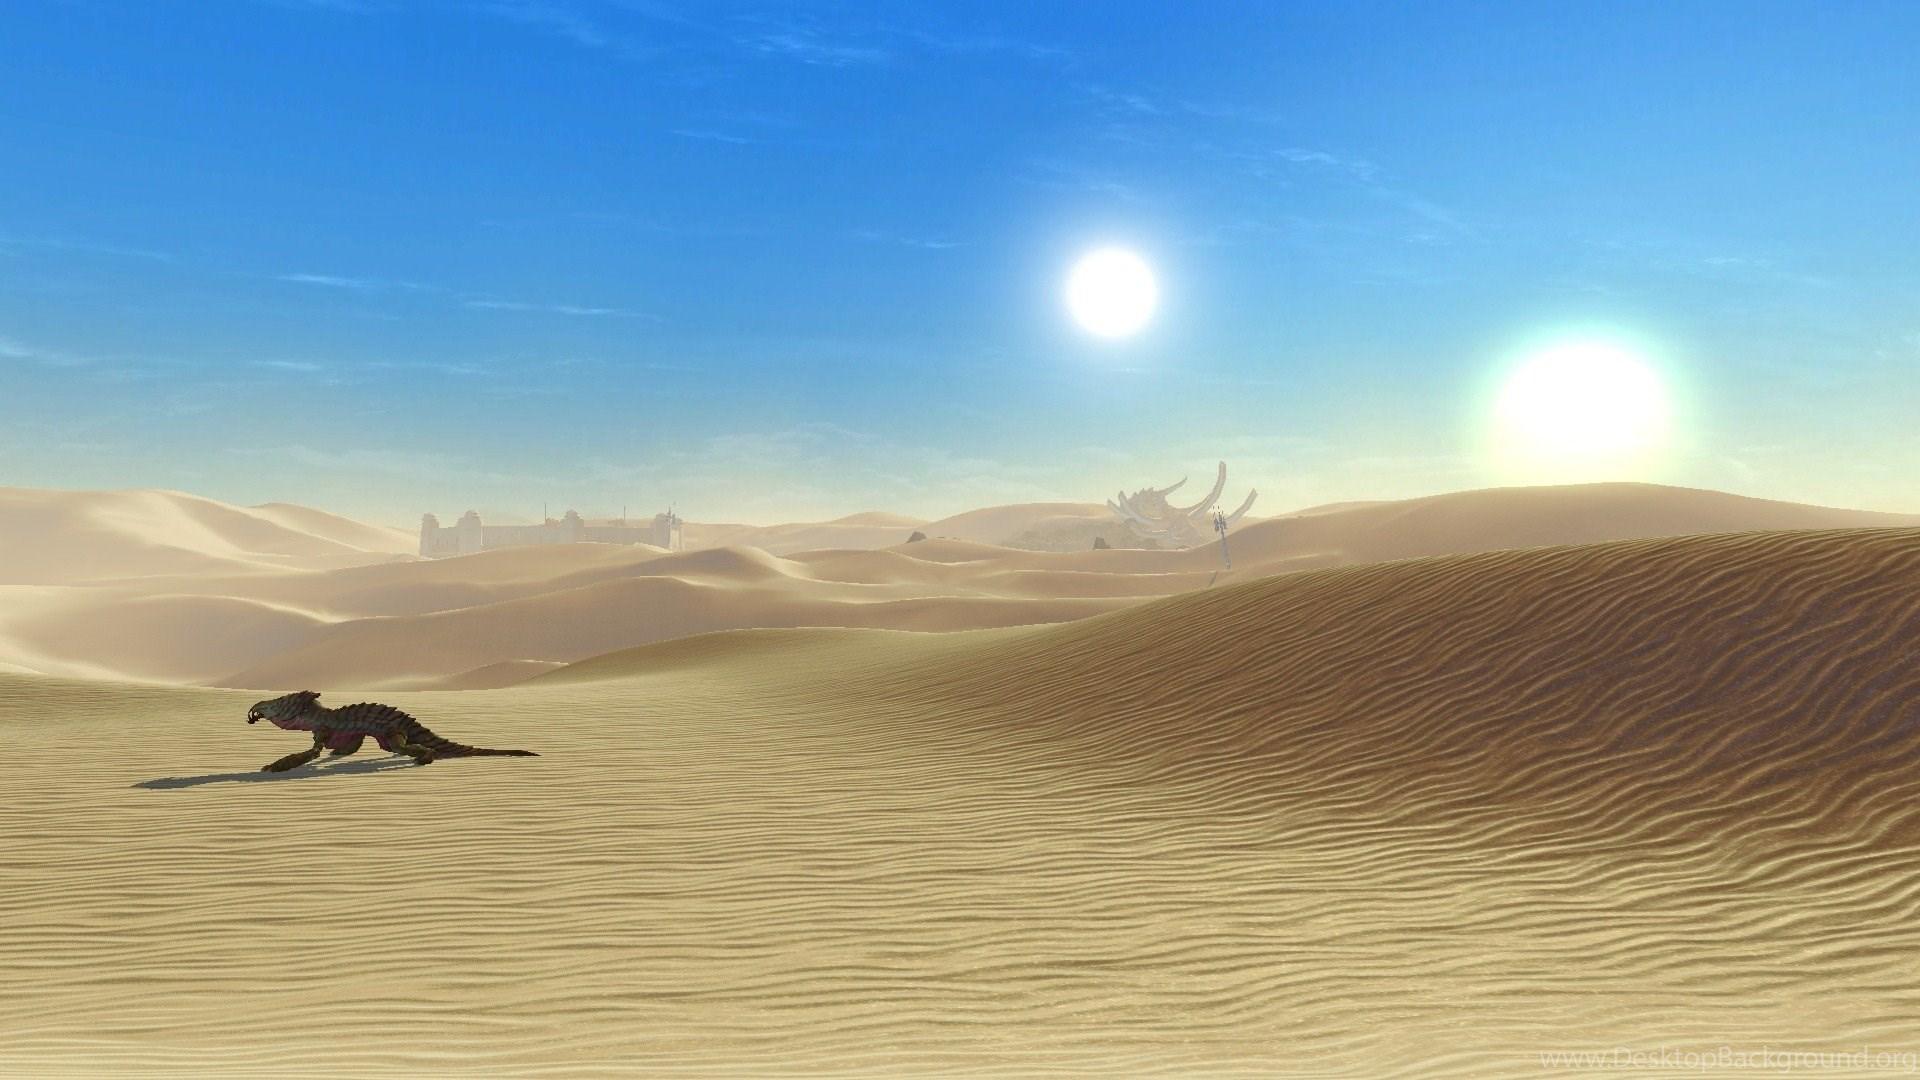 Swtor Tatooine Mmorpg Com Star Wars The Old Republic Galleries Desktop Background